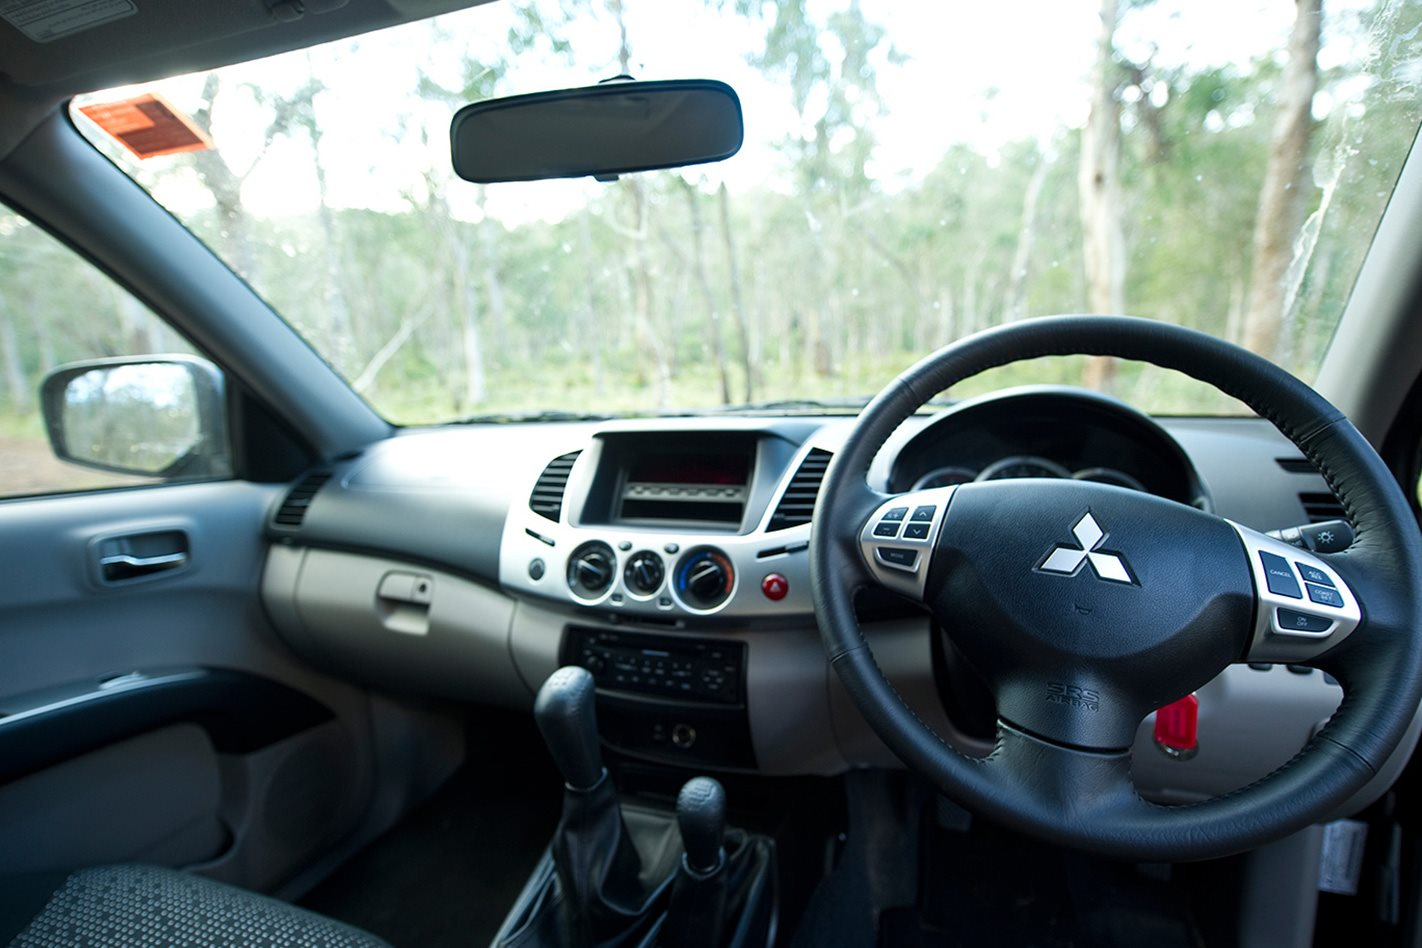 2011-Mitsubishi-Triton-steering-wheel.jpg